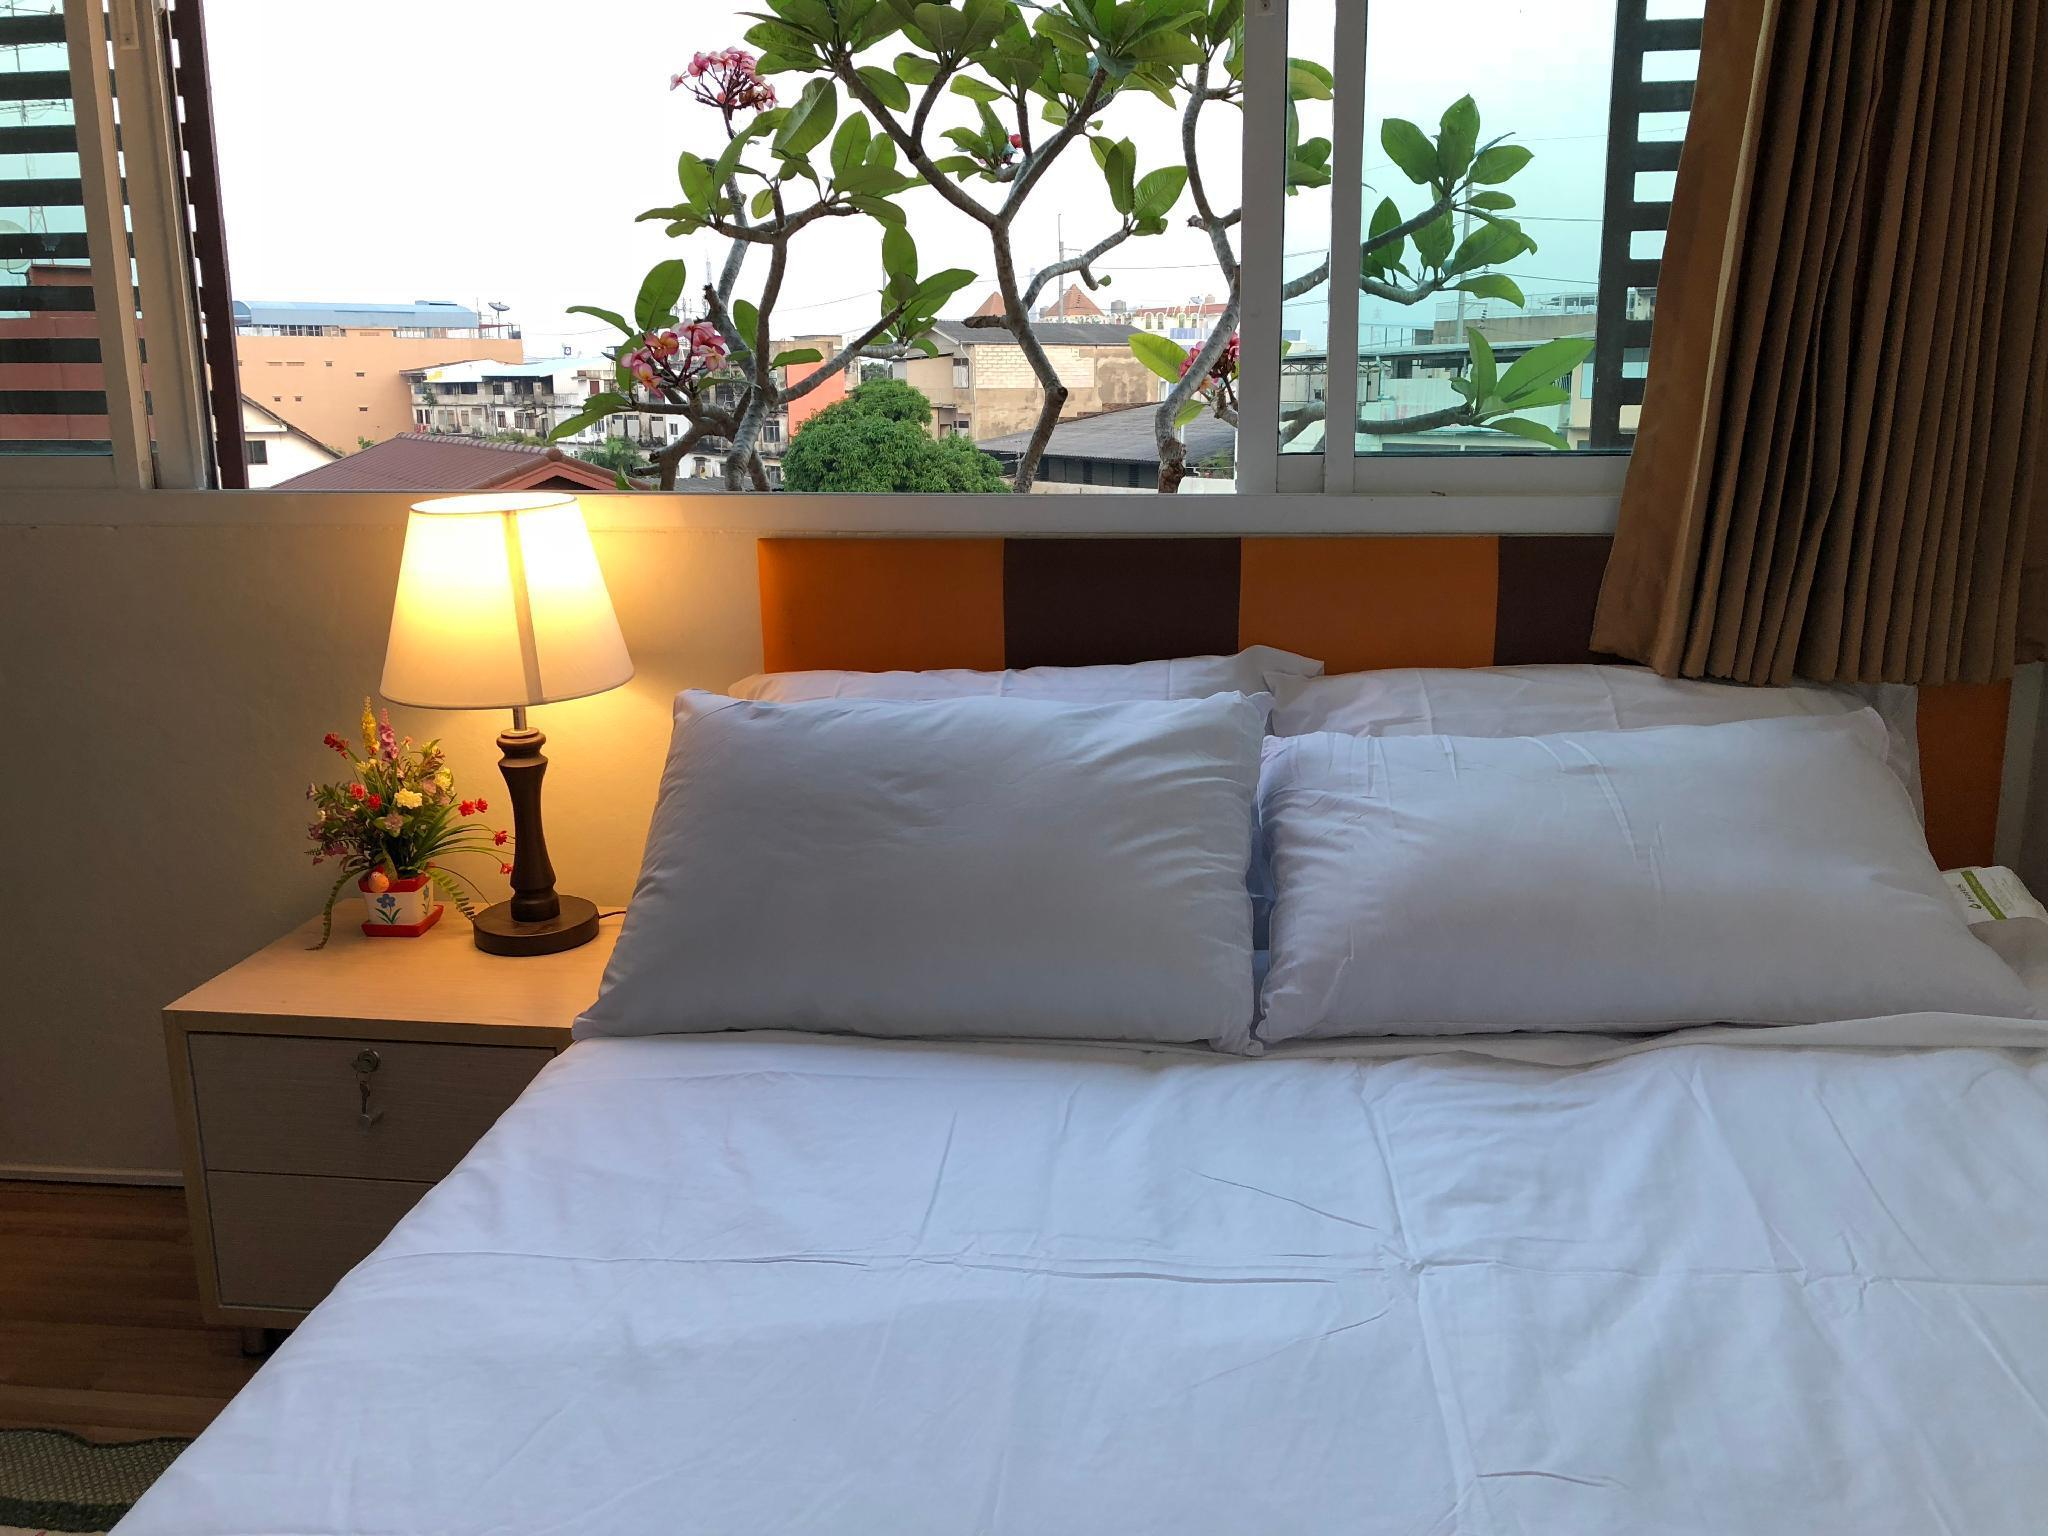 Lana place, Suksawat road Samutprakarn อพาร์ตเมนต์ 1 ห้องนอน 1 ห้องน้ำส่วนตัว ขนาด 16 ตร.ม. – ธนบุรีตอนใต้